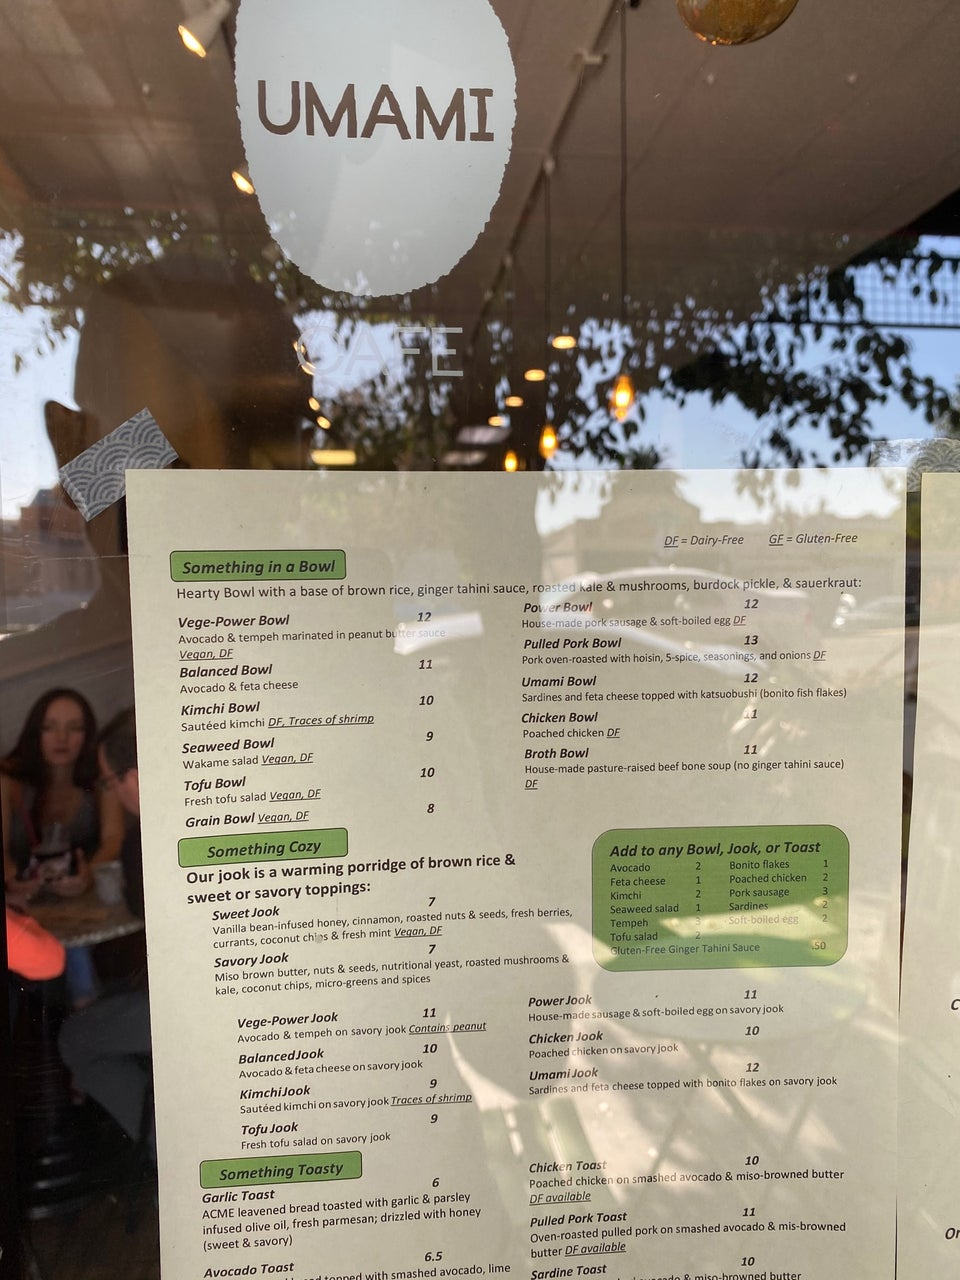 Cafe Umami 2224 MacArthur Blvd, Oakland